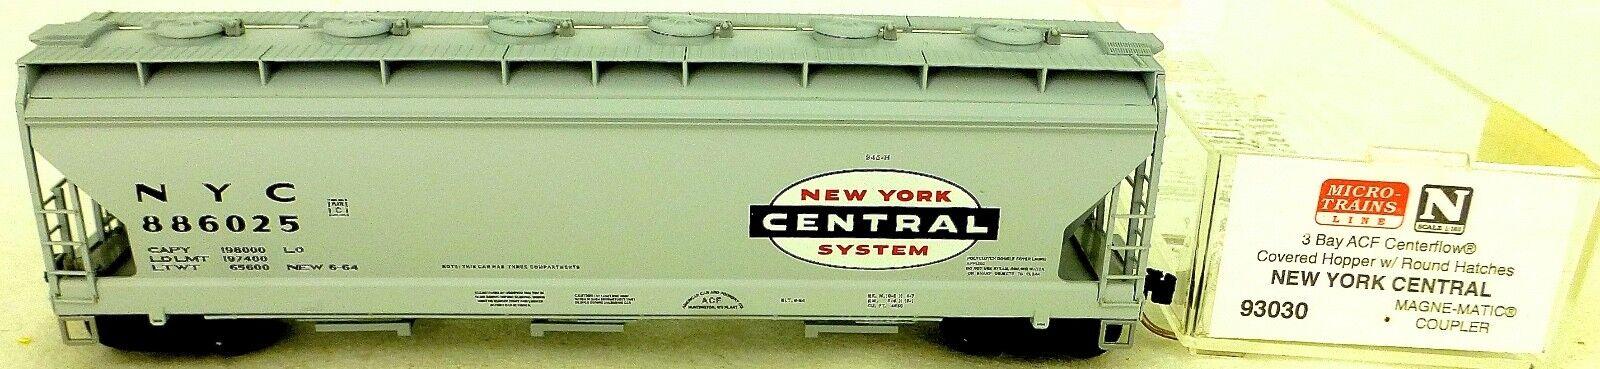 Micro-Treni Line 93030 2-Bay Centro Flow New York Central N 1: 160 x Å